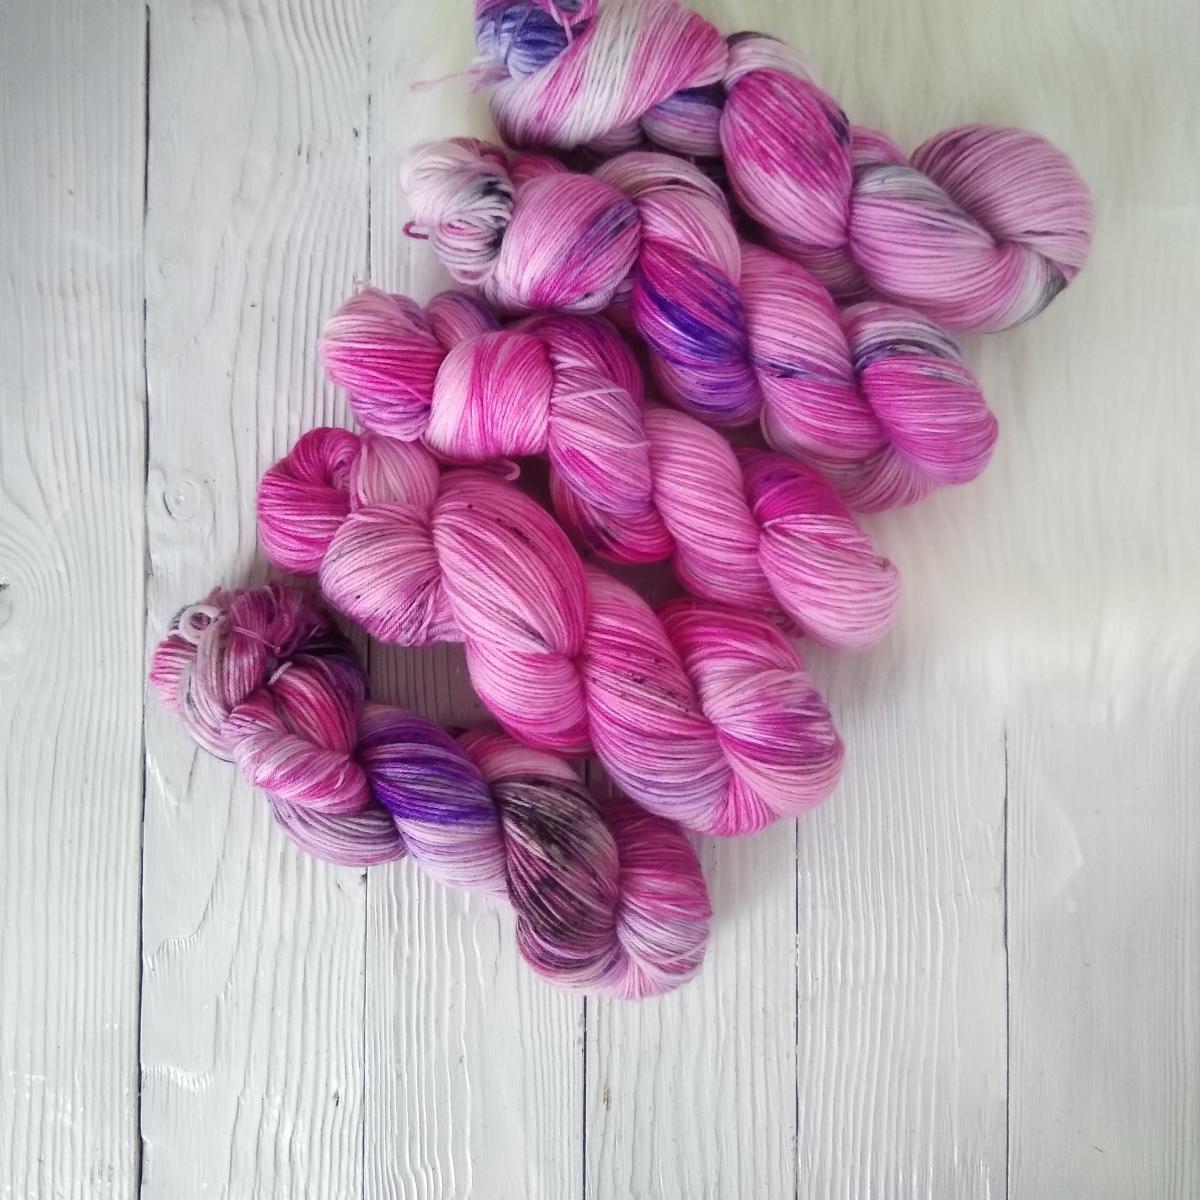 woodico.pro hand dyed yarn 041 6 1200x1200 - Hand dyed yarn / 041